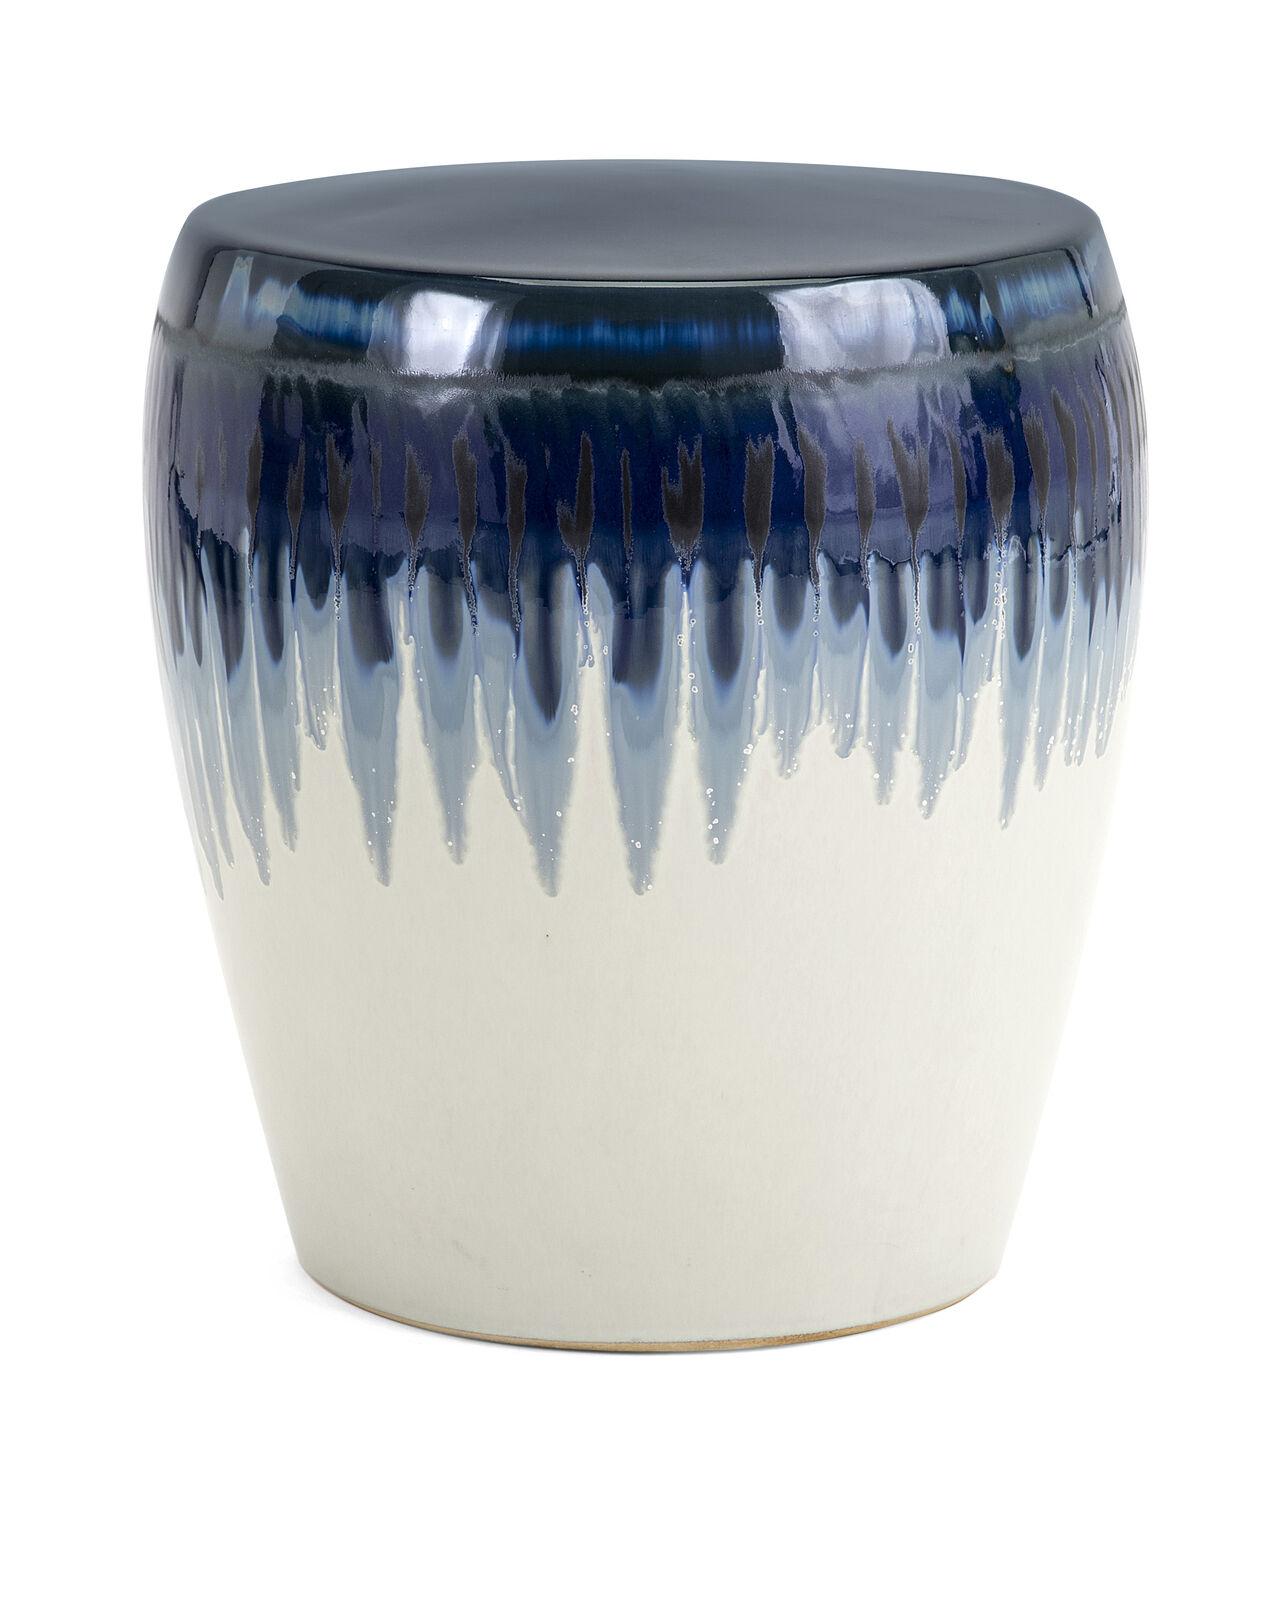 Details About Imax Hamako Ceramic Garden Stool In Blue Finish 13724 Regarding Janke Floral Garden Stools (View 17 of 25)